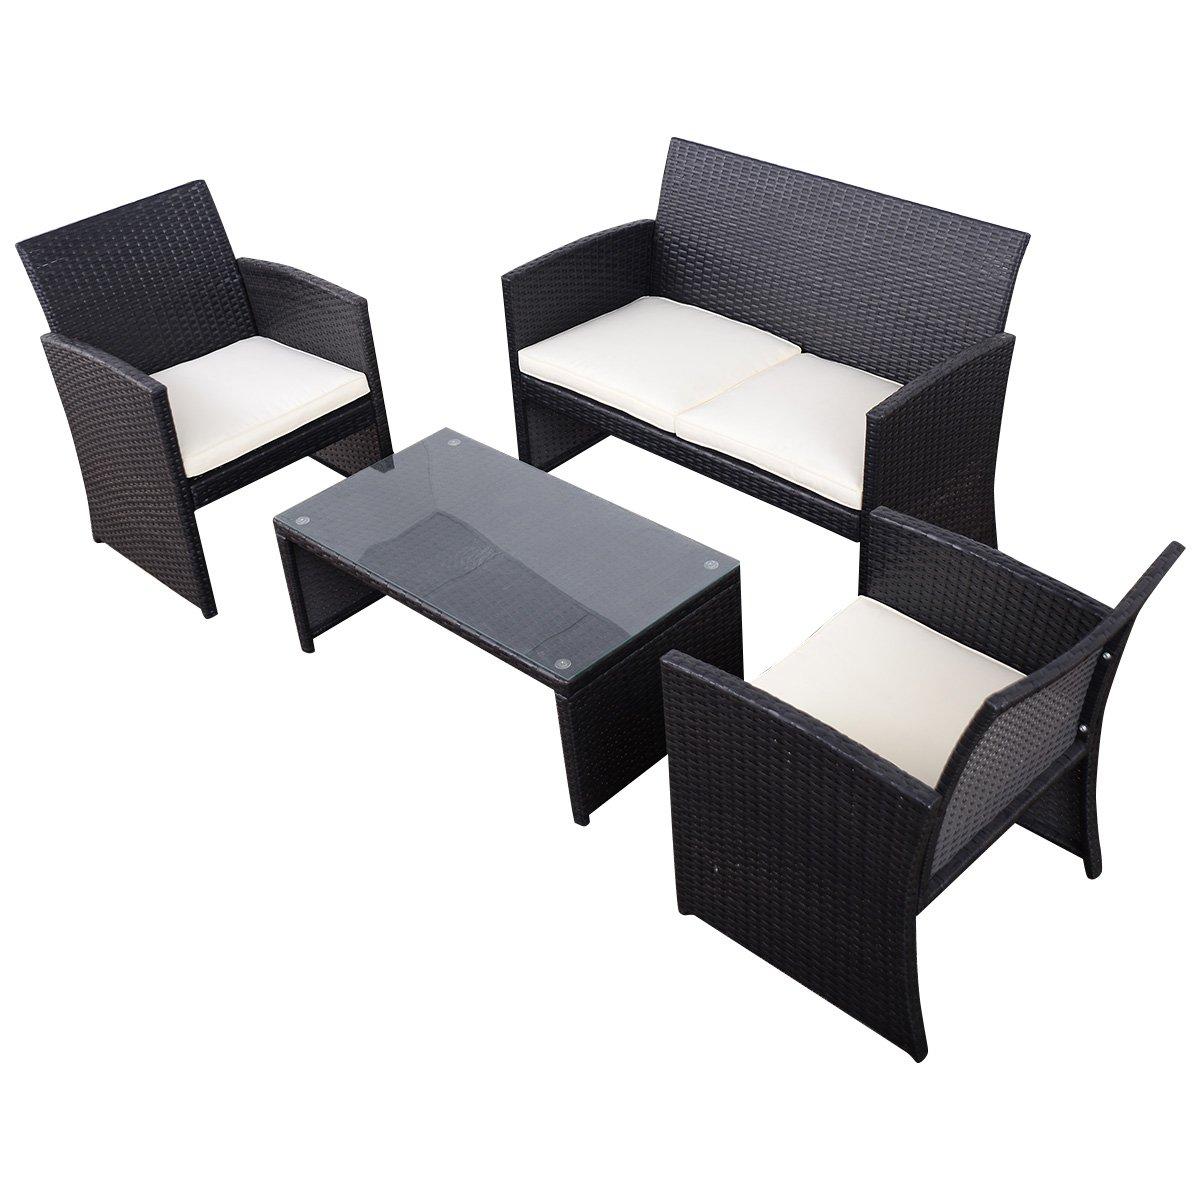 Tangkula 4 Piece Outdoor Patio Sofa Set Lawn Garden Outdoor PE Rattan Wicker Furniture Sets (Black)